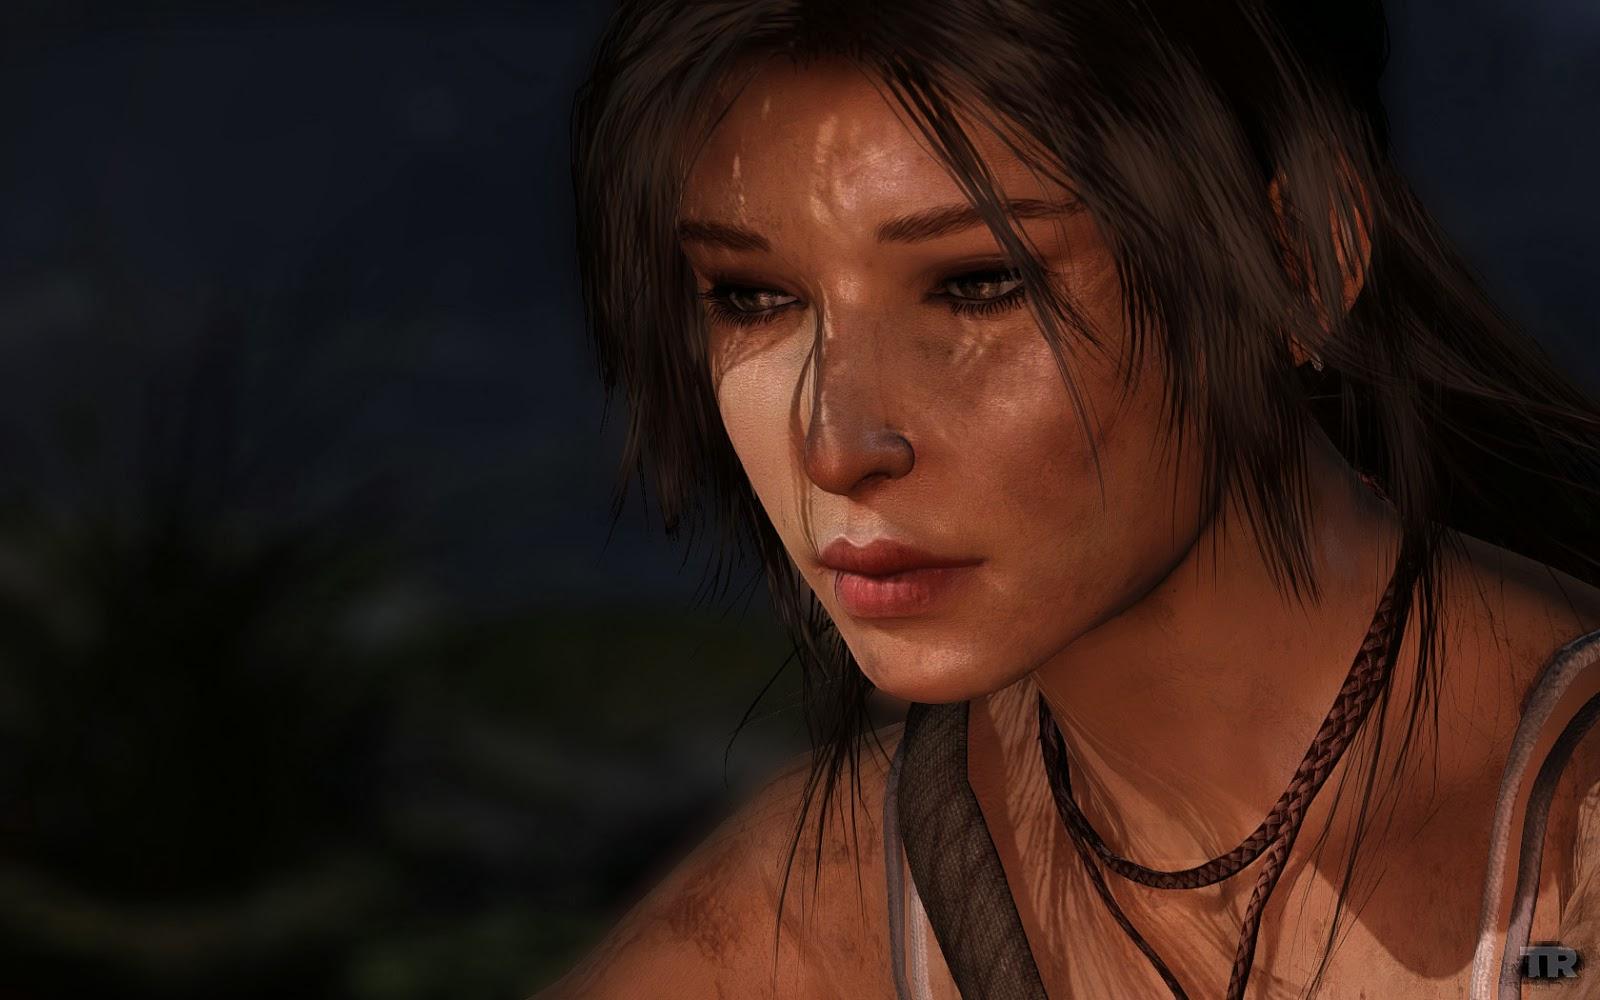 Tomb Raider Definitive Edition เปรียบเทียบระหว่าง PS4 กับ PS3